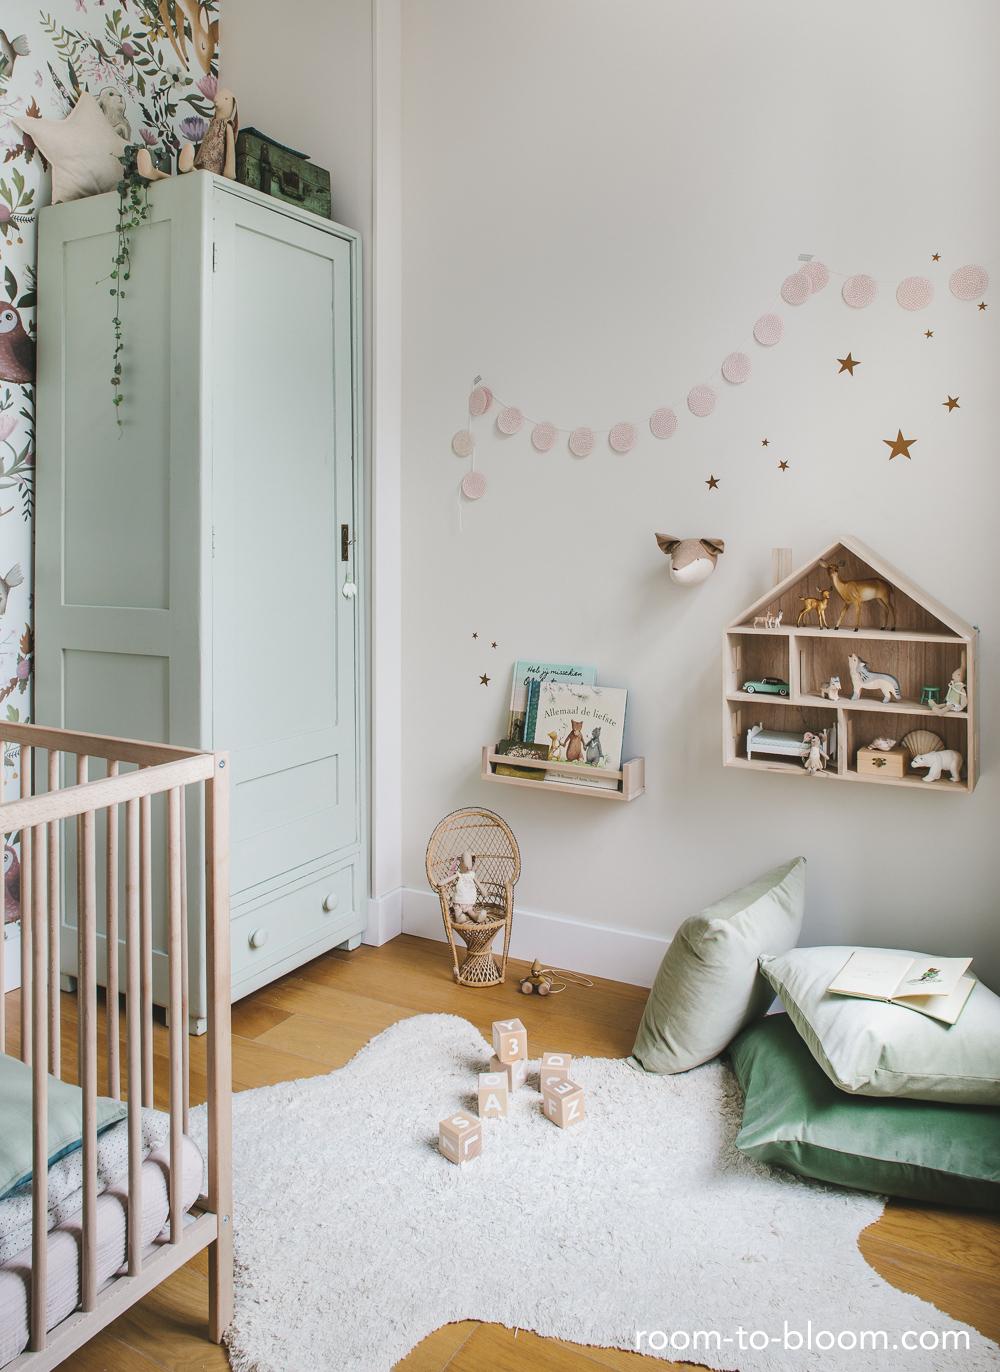 Nursery Interior Design Images Gallery